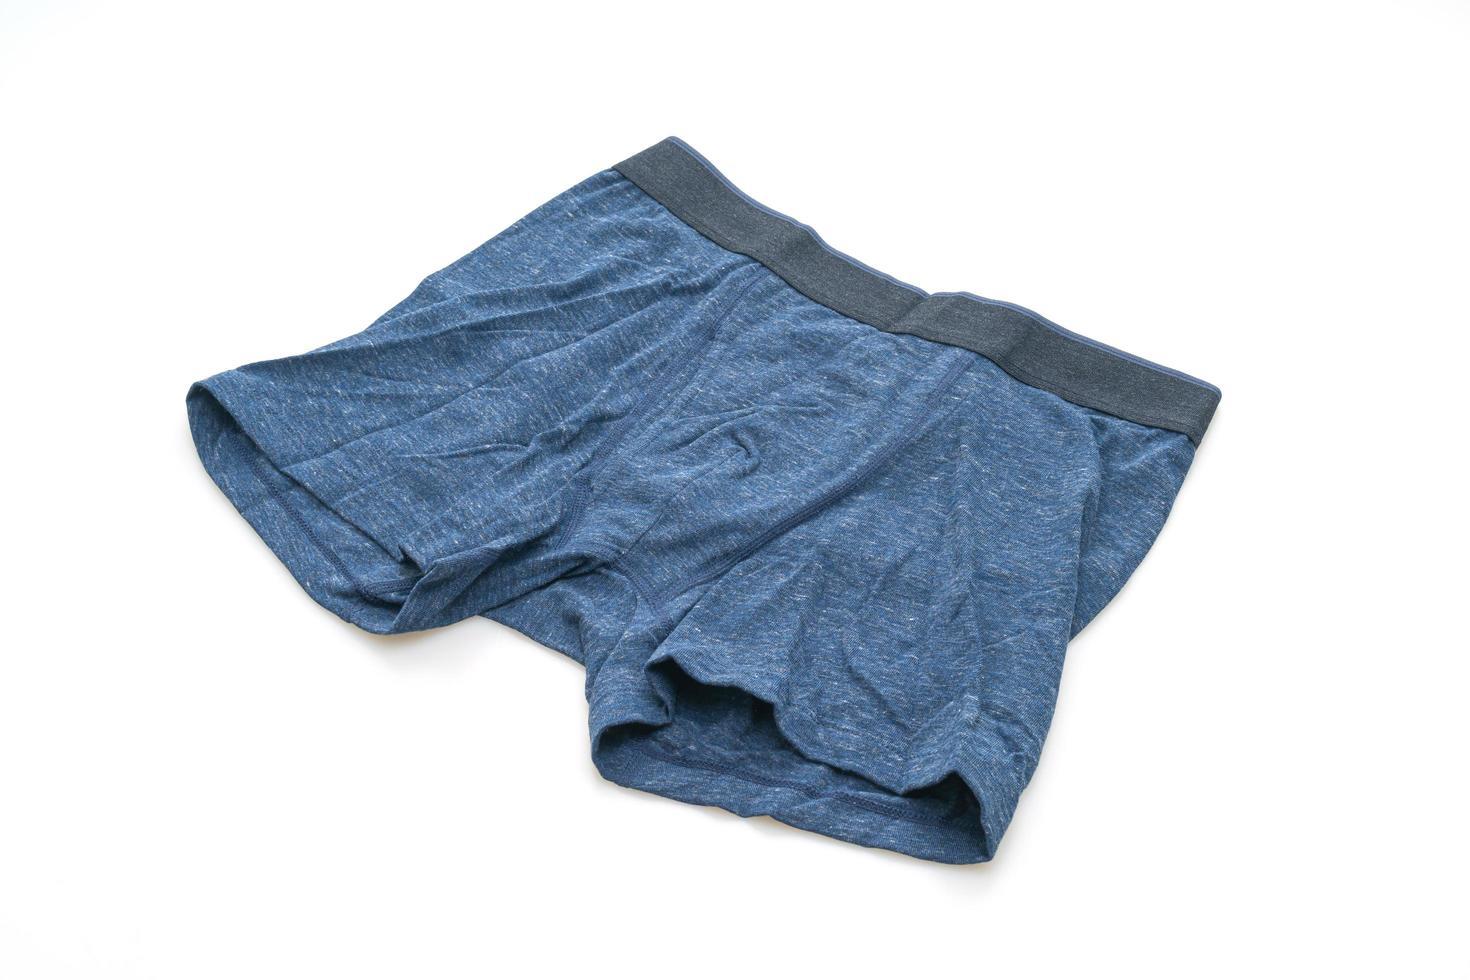 biancheria intima da uomo blu isolata su sfondo bianco foto